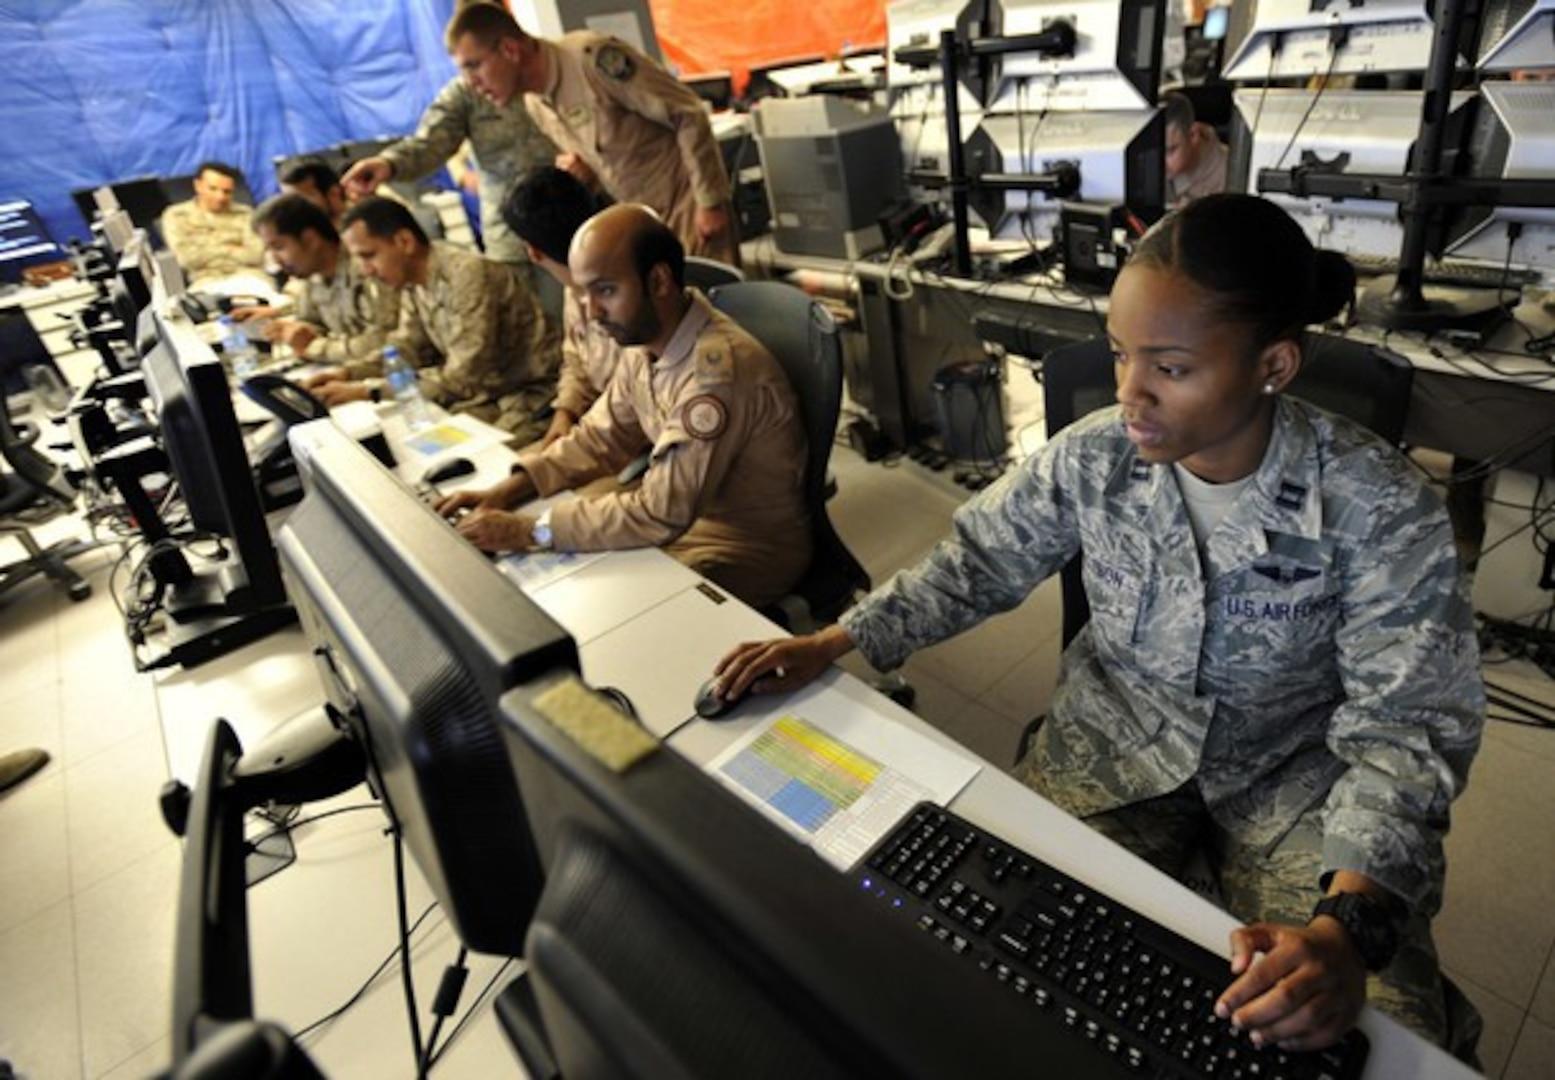 Capt. Mechell Dotson serves as the host nation air operations center liaison during Arabian Gulf Shield, Feb. 3, 2016, at the Combined Air Operations Center, Al Udeid Air Base, Qatar. (U.S. Air Force photo by Master Sgt. Joshua Strang)